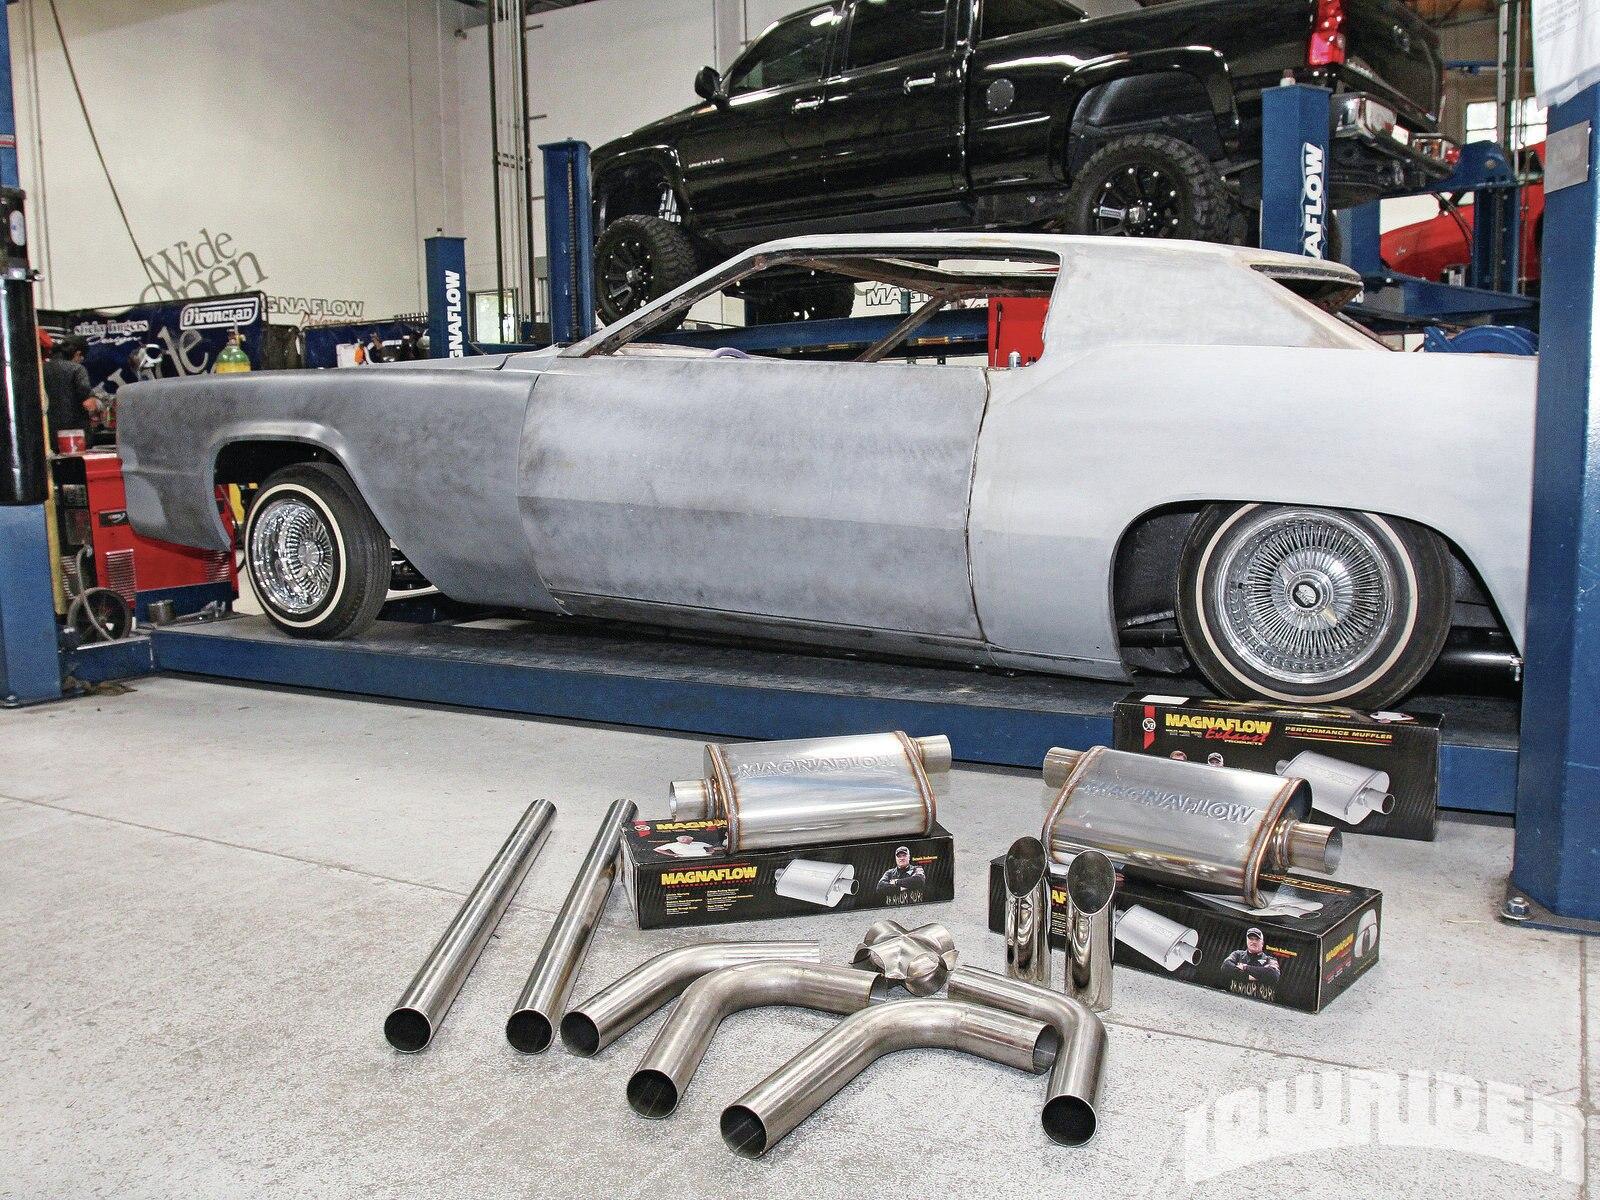 1212-lrmp-01-o-magnaflow-performance-exhaust-project-helldorado1